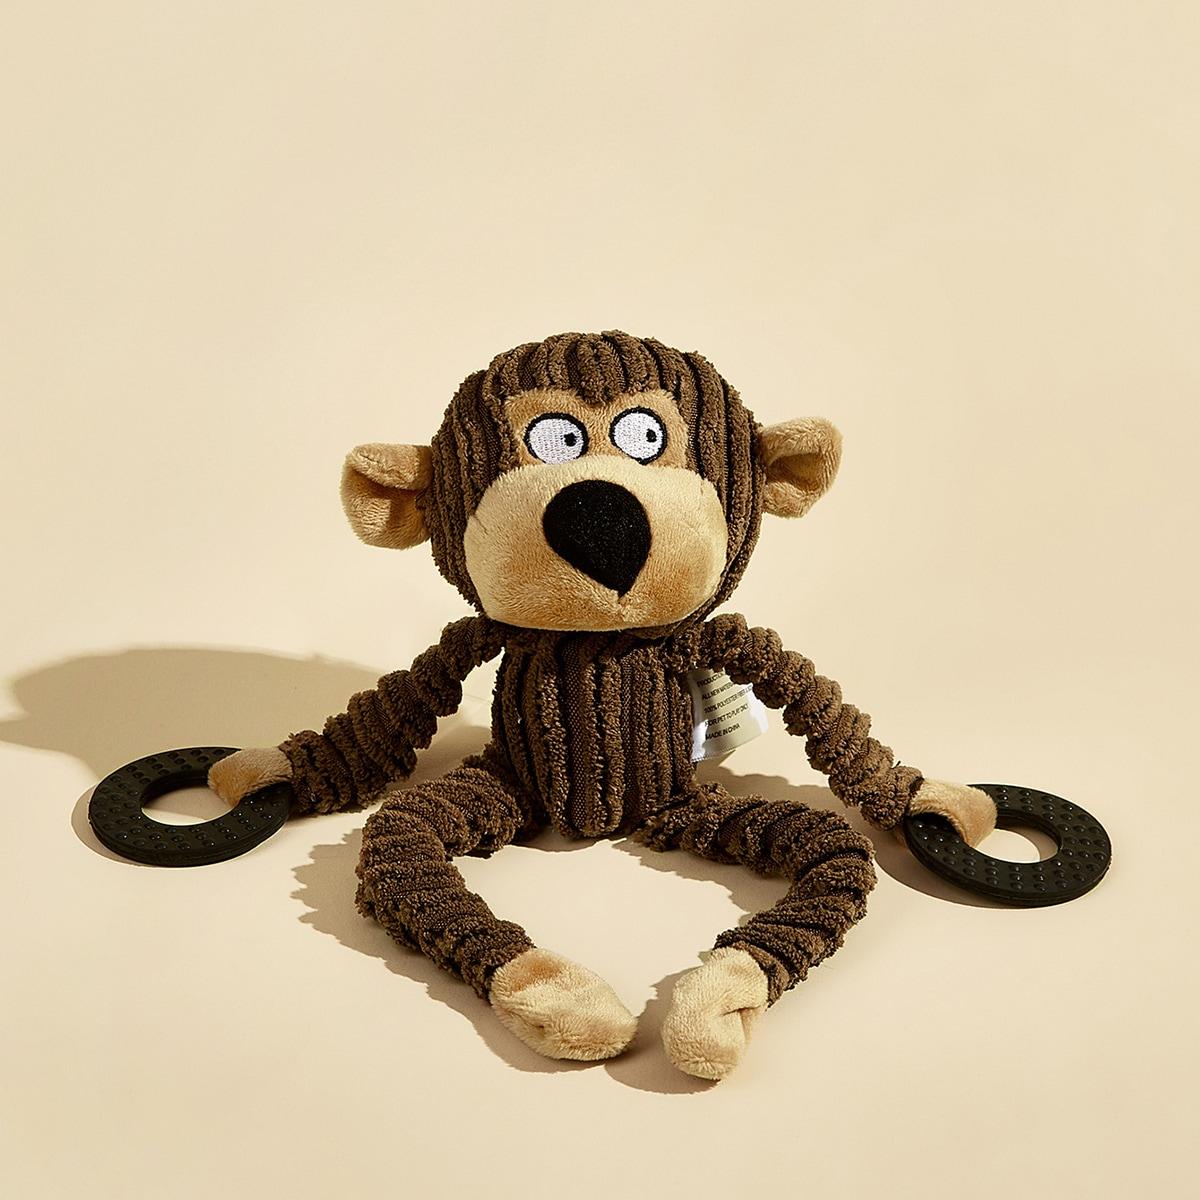 1 Stück Hundespielzeug in Karikatur Affeform